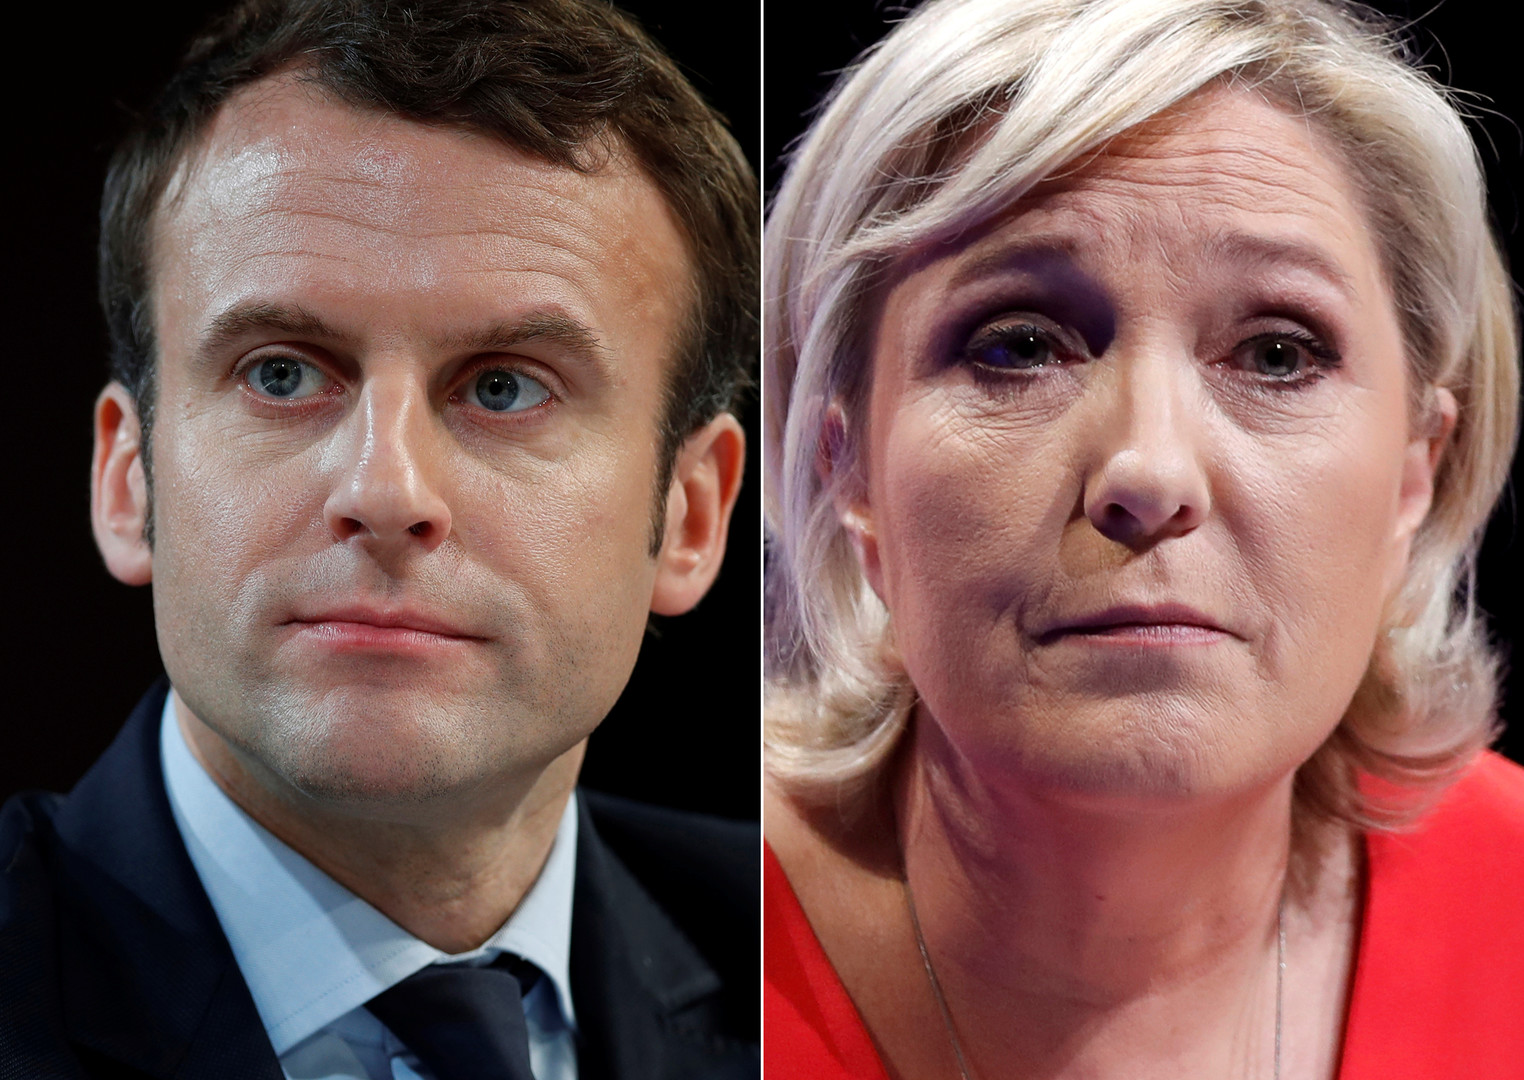 Тест RT: Макрон или Ле Пен?